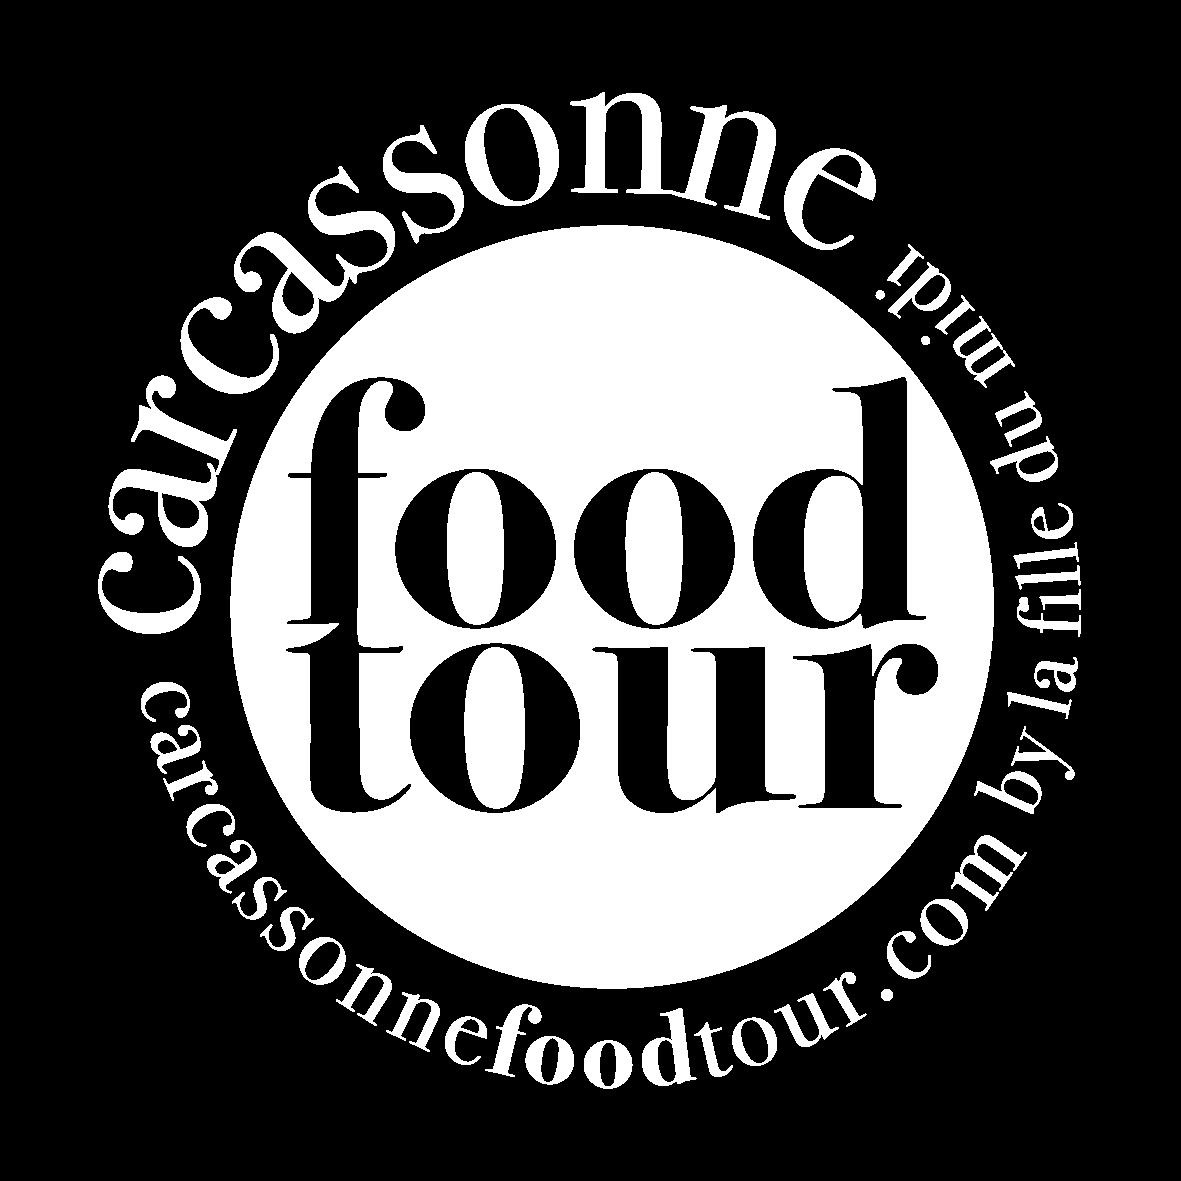 Logo Carcassonnefoodtour